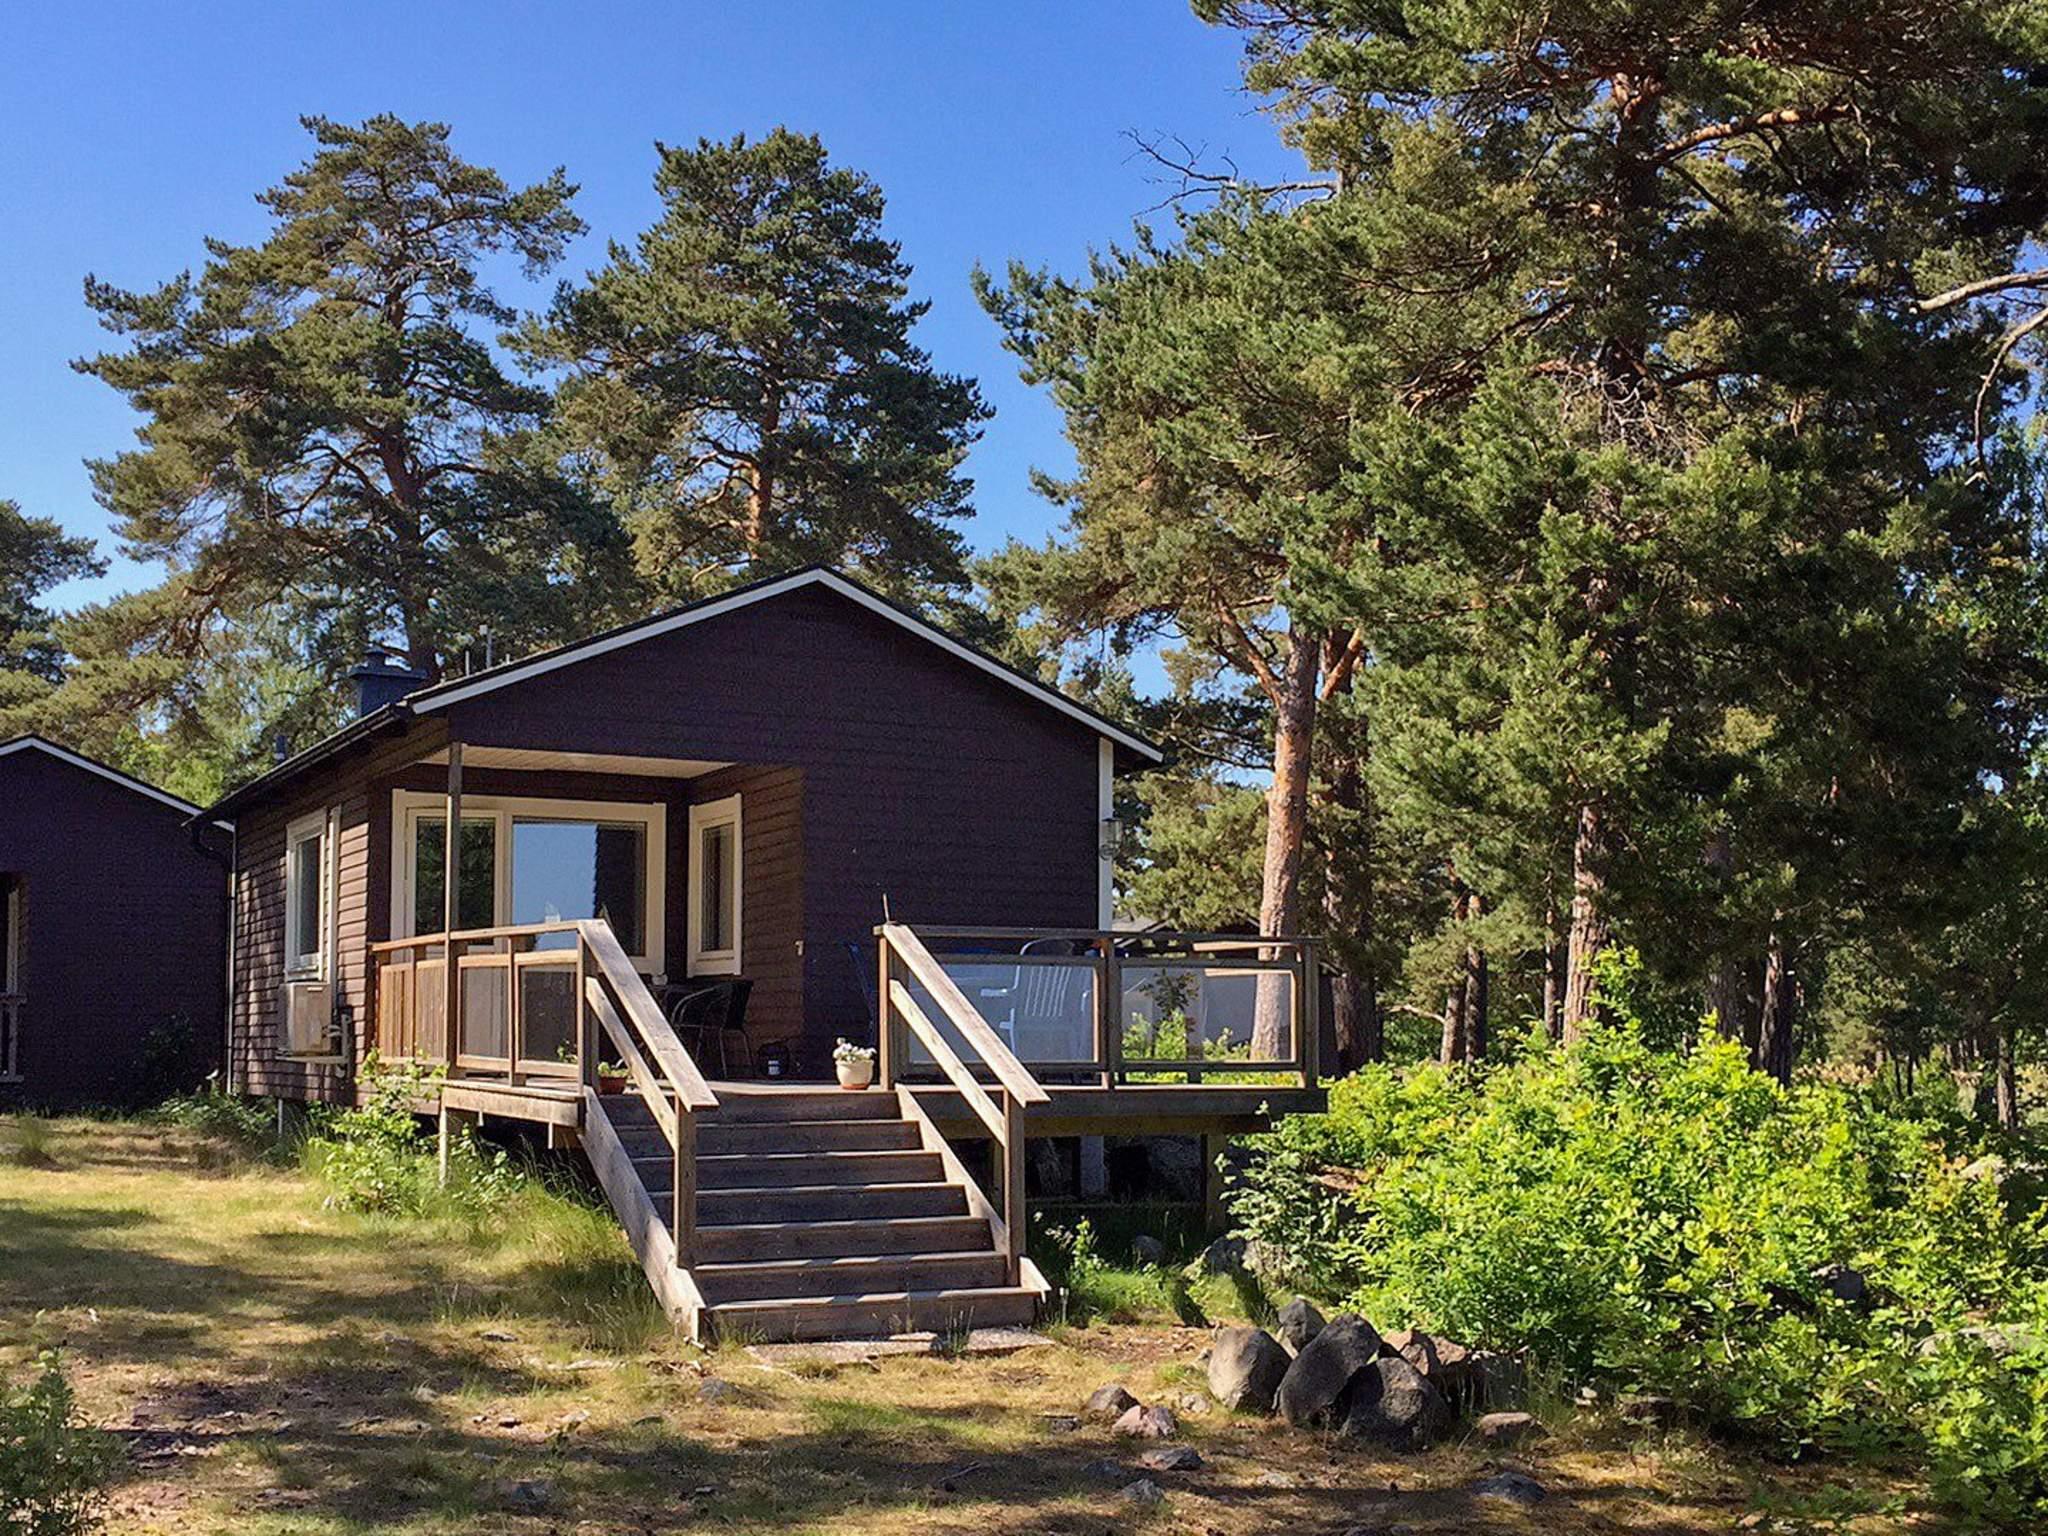 Ferienhaus Oskarshamn (2358219), Oskarshamn, Kalmar län, Südschweden, Schweden, Bild 12